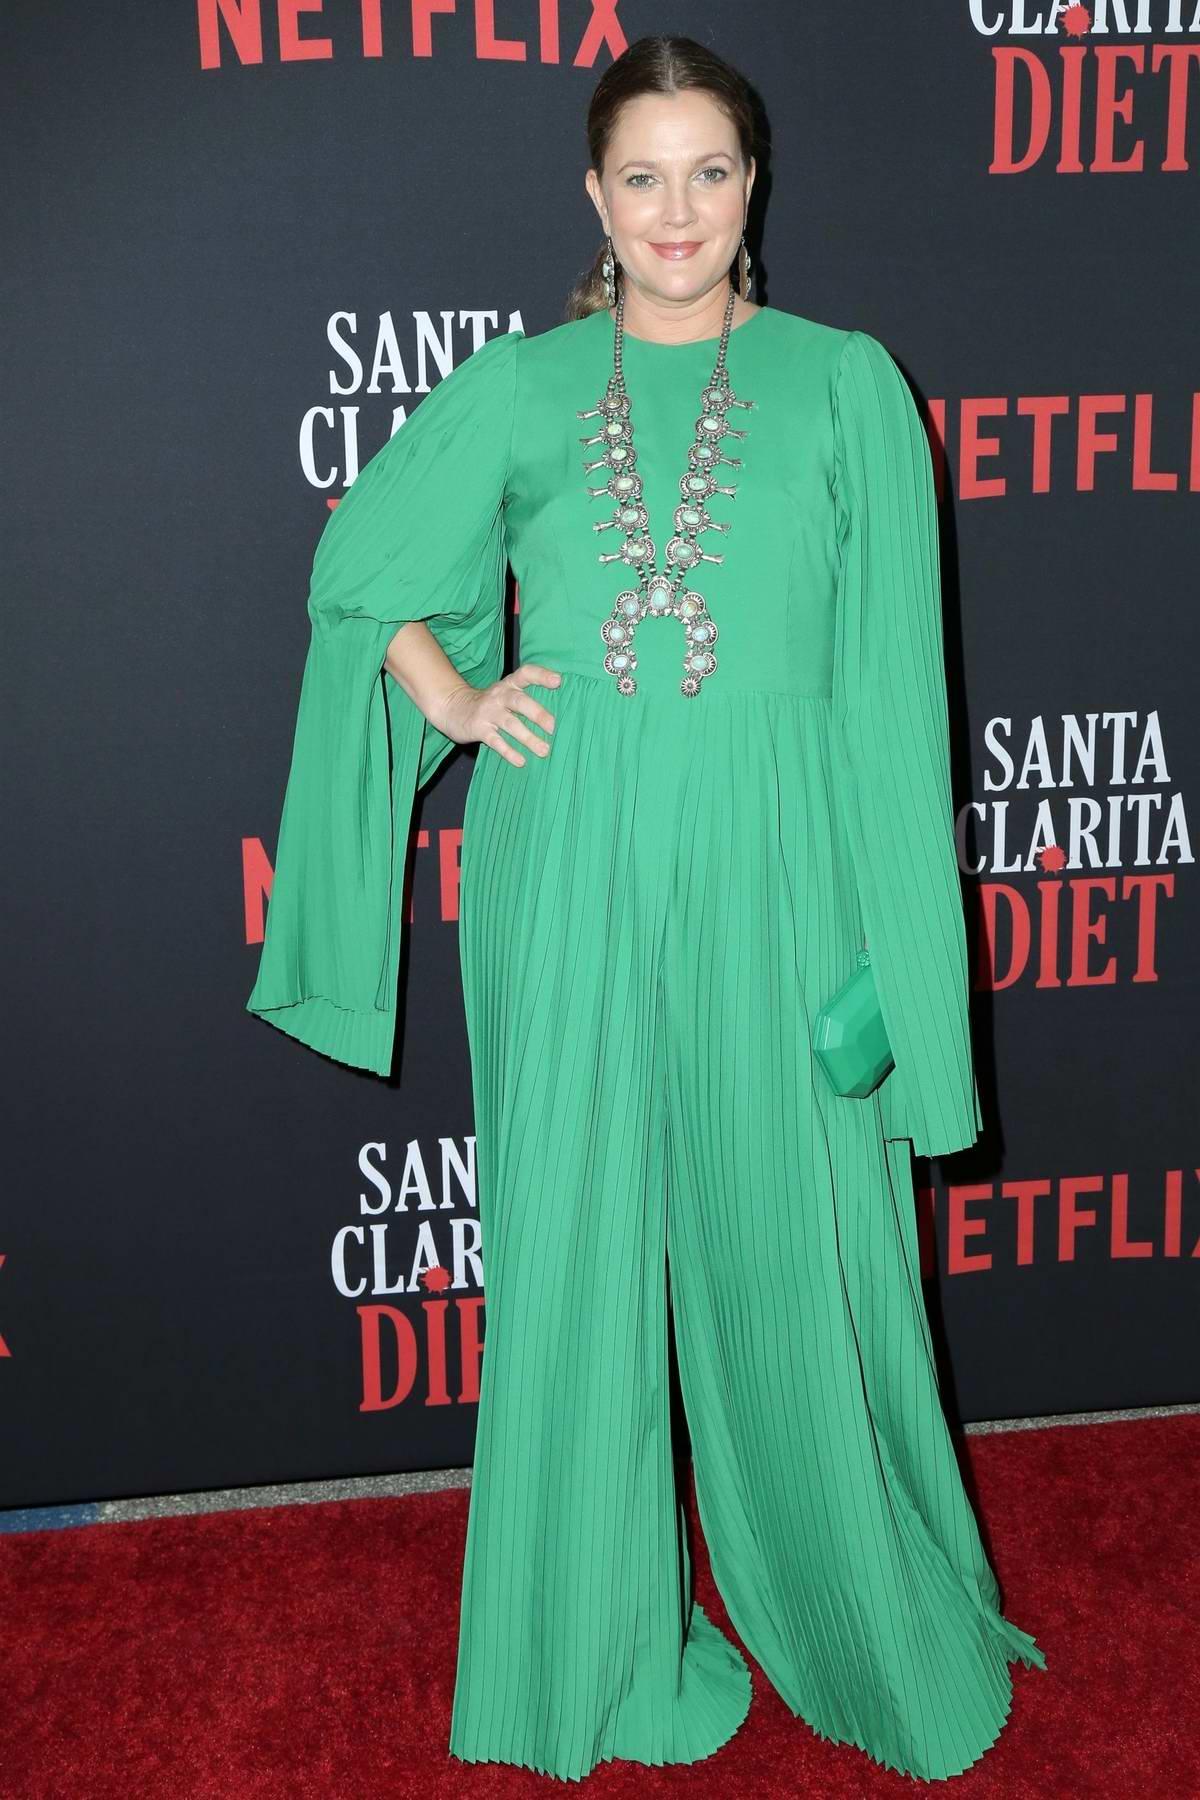 Drew Barrymore attends Netflix' 'Santa Clarita Diet' Season 3 TV Show Premiere in Los Angeles